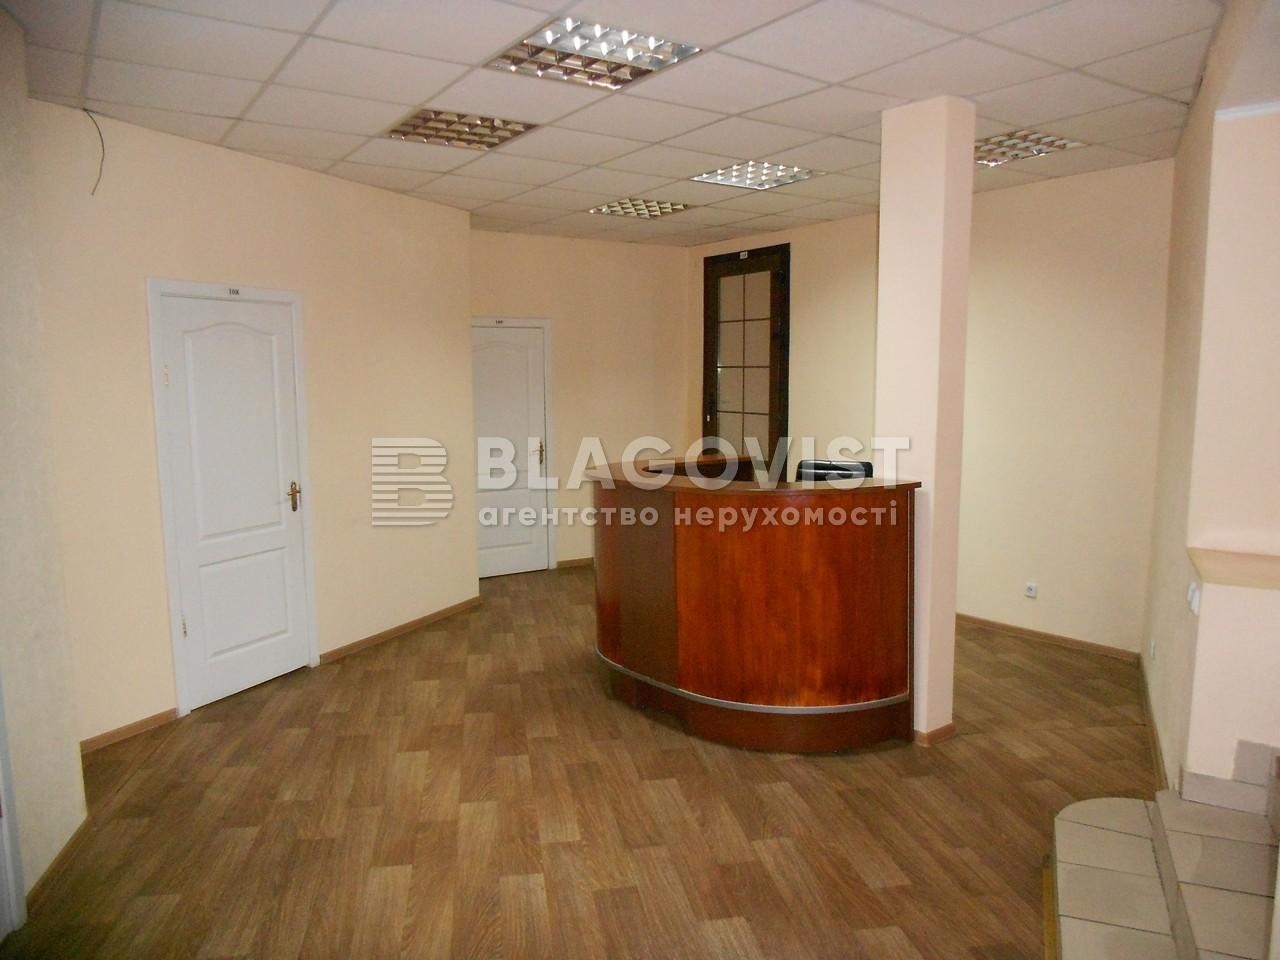 Офис, D-29095, Сагайдачного Петра, Киев - Фото 10